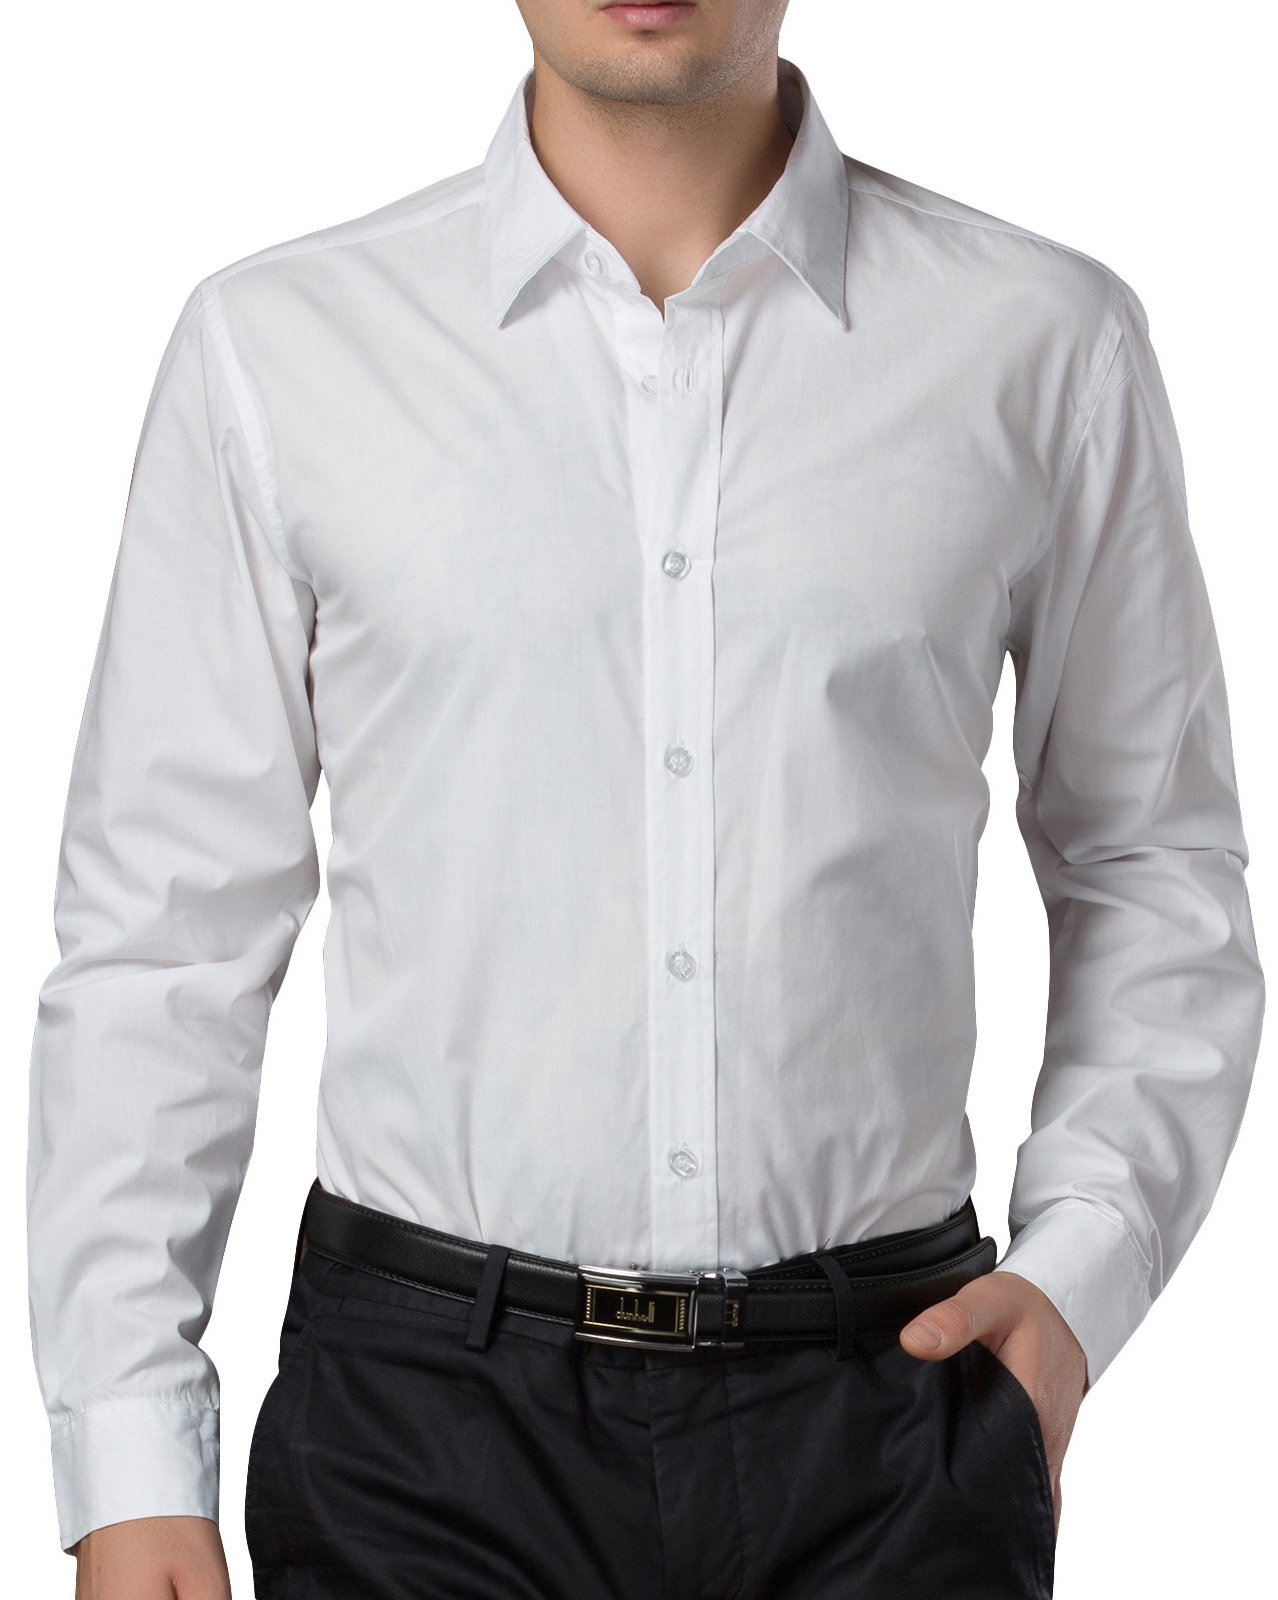 Men's Casual Business Slim Fit Shirt Button Down